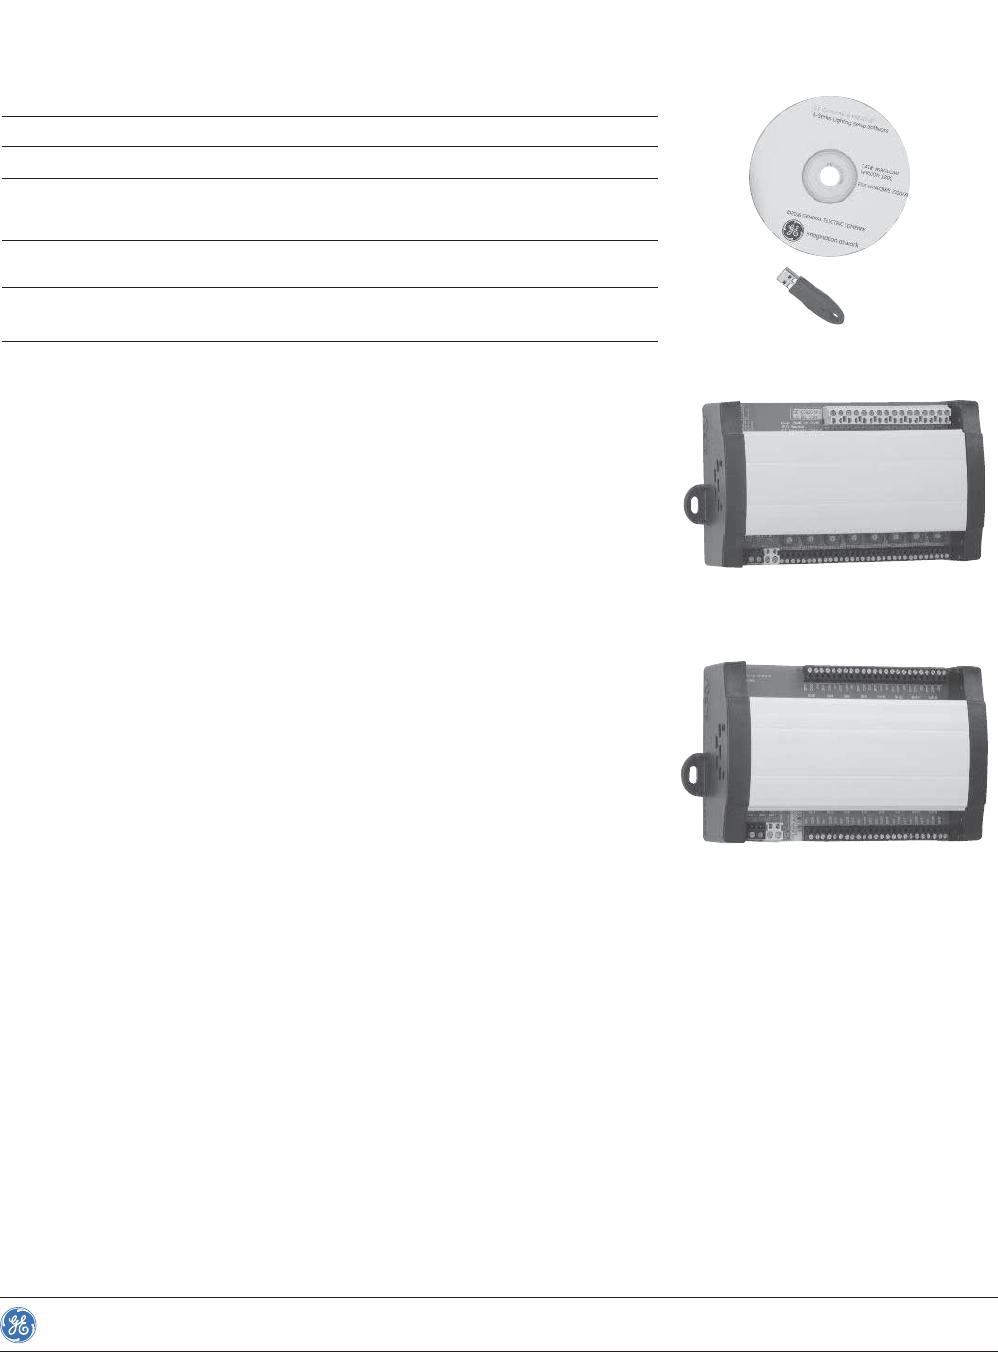 GE BuyLog — Section 11 1000504894 Catalog